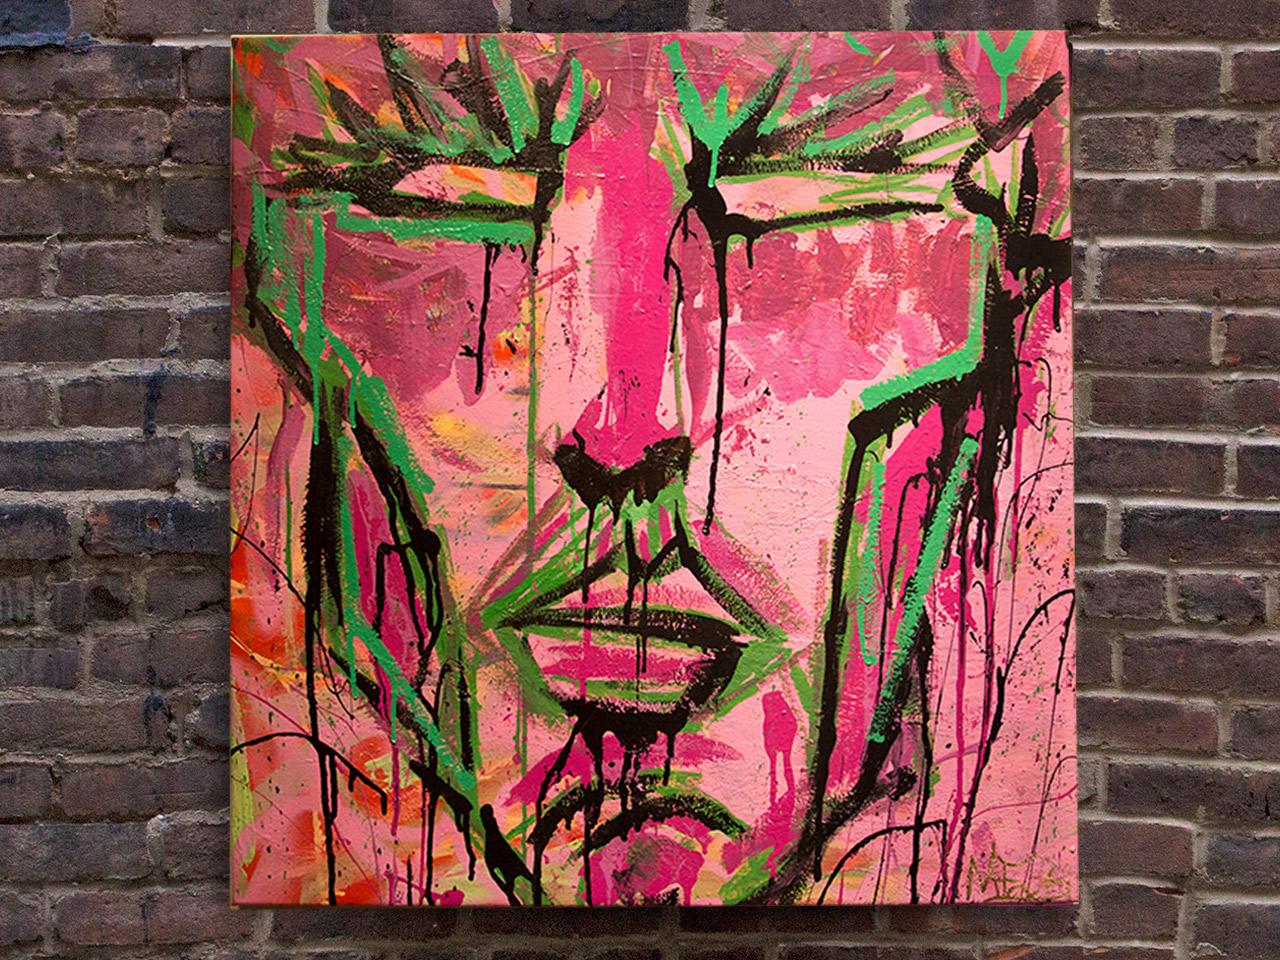 Tiago, 2014, (Caras e Cores Series) Paint, 27 x 28 inches.